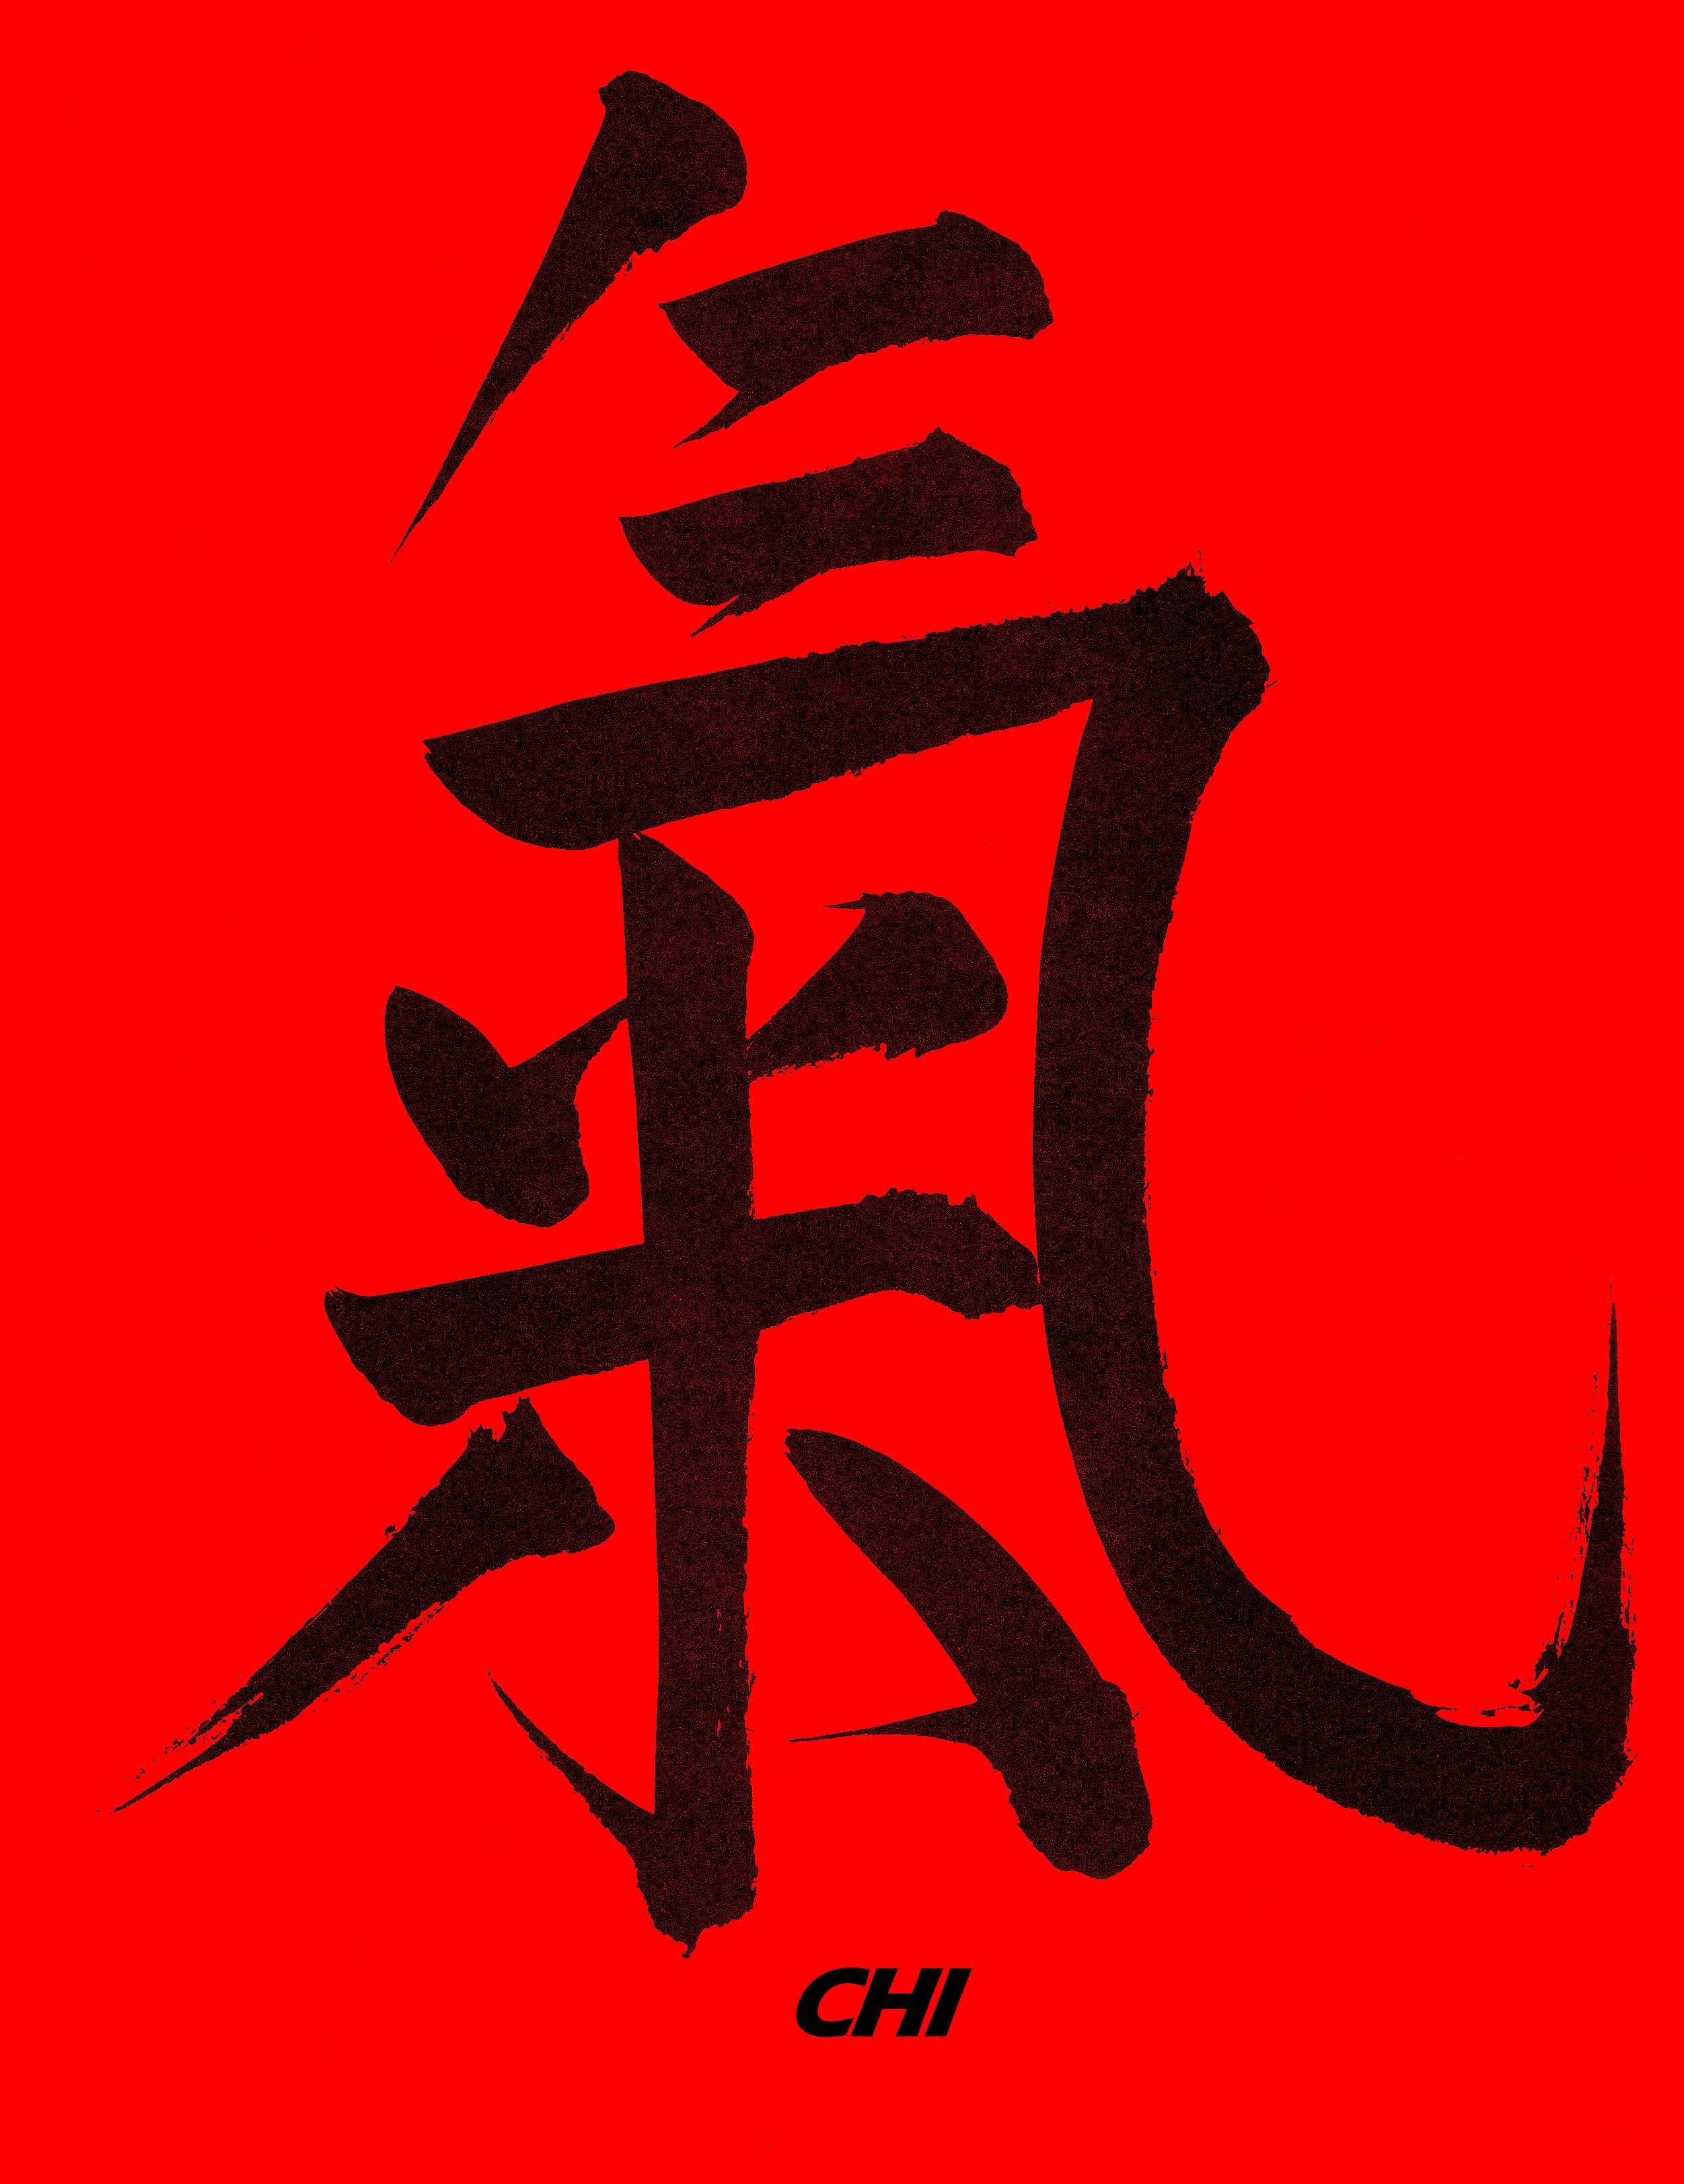 chi-al-huang-calligraphy4